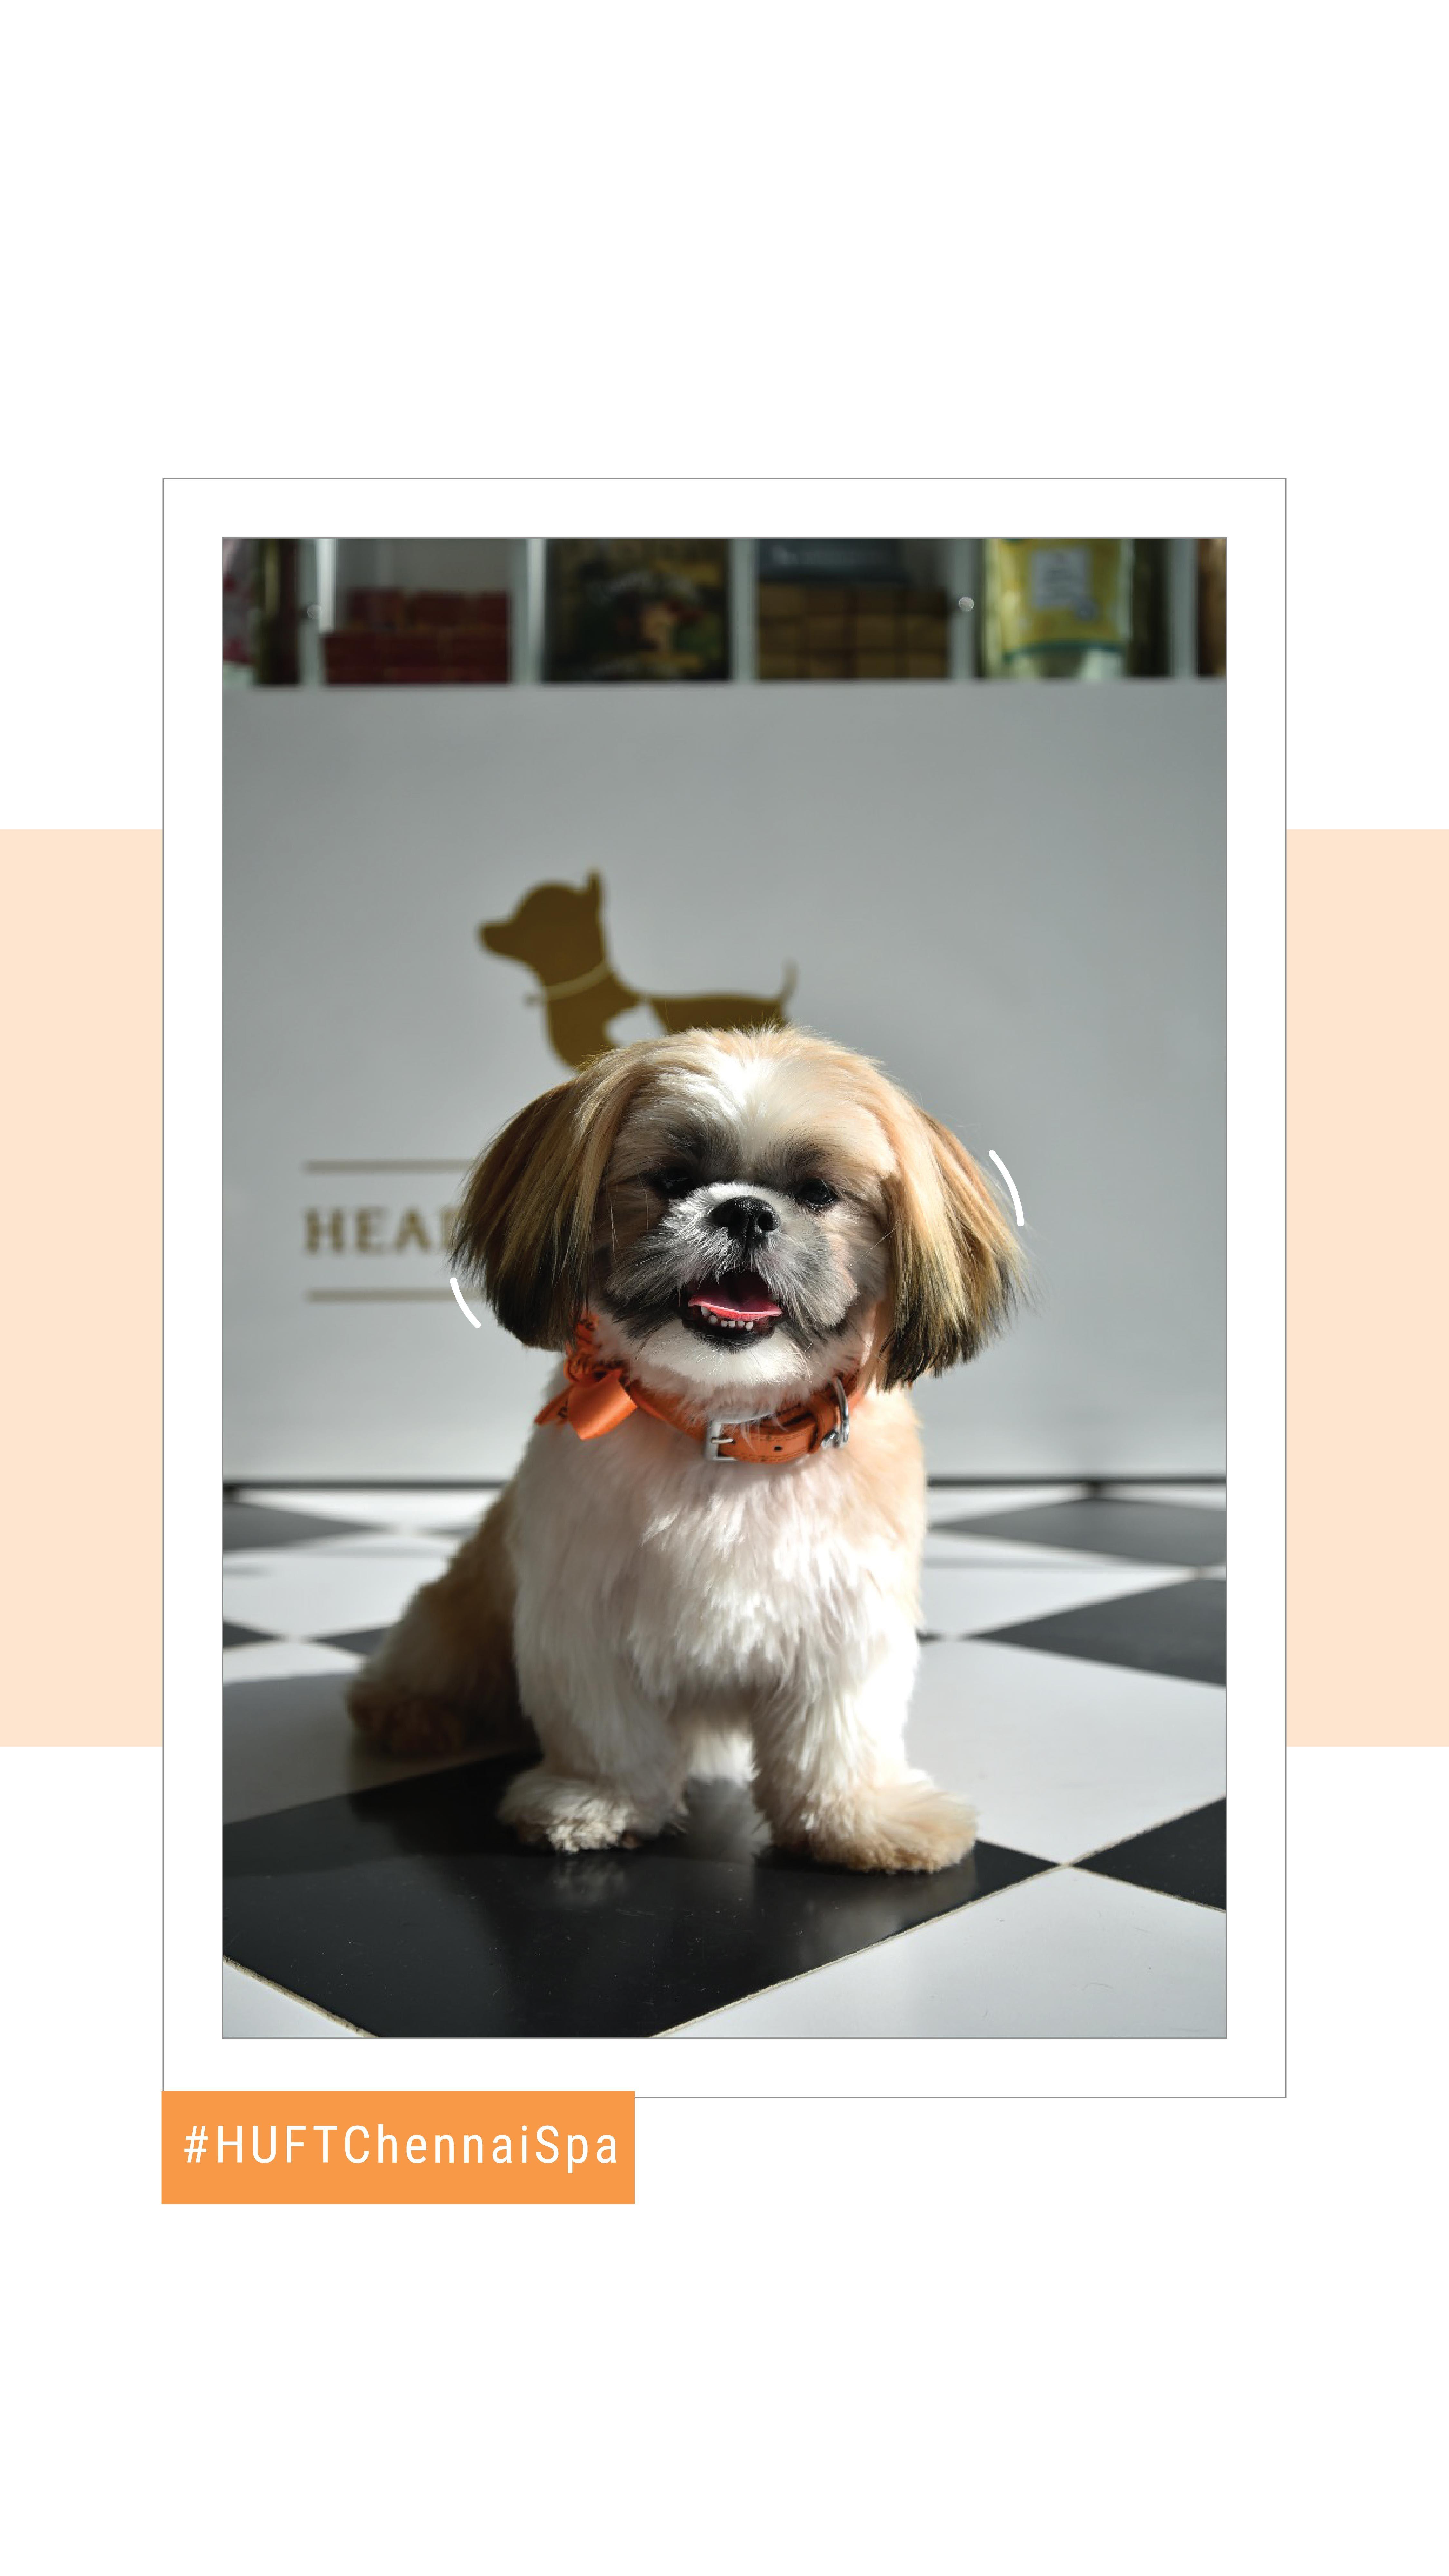 Chennai Spa Headsupfortails Buy Pets Online Pet Supplies Pets